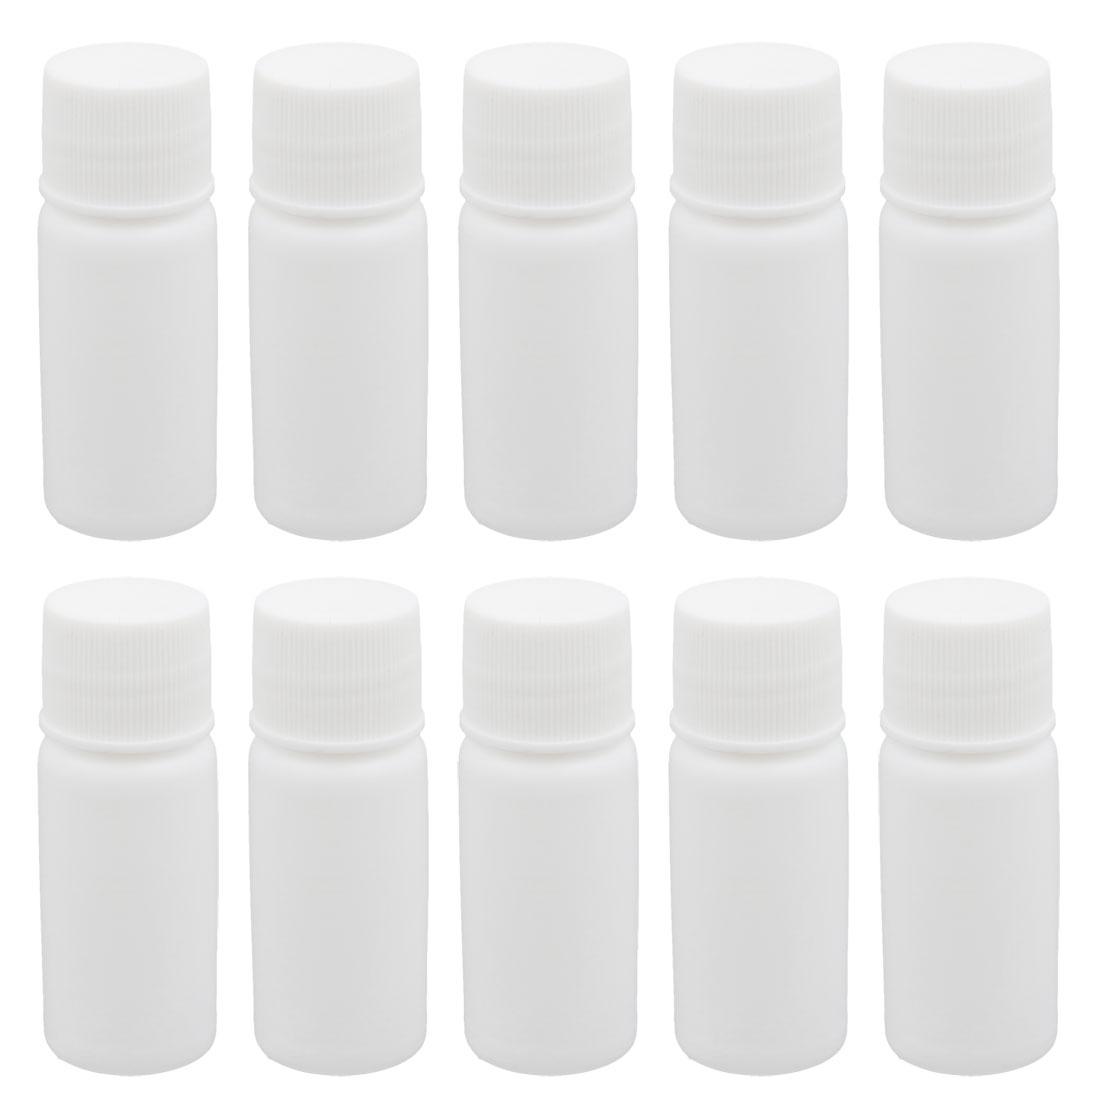 10pcs 0.3oz HDPE Plastic White Refillable Narrow Mouth Storage Bottle Jar